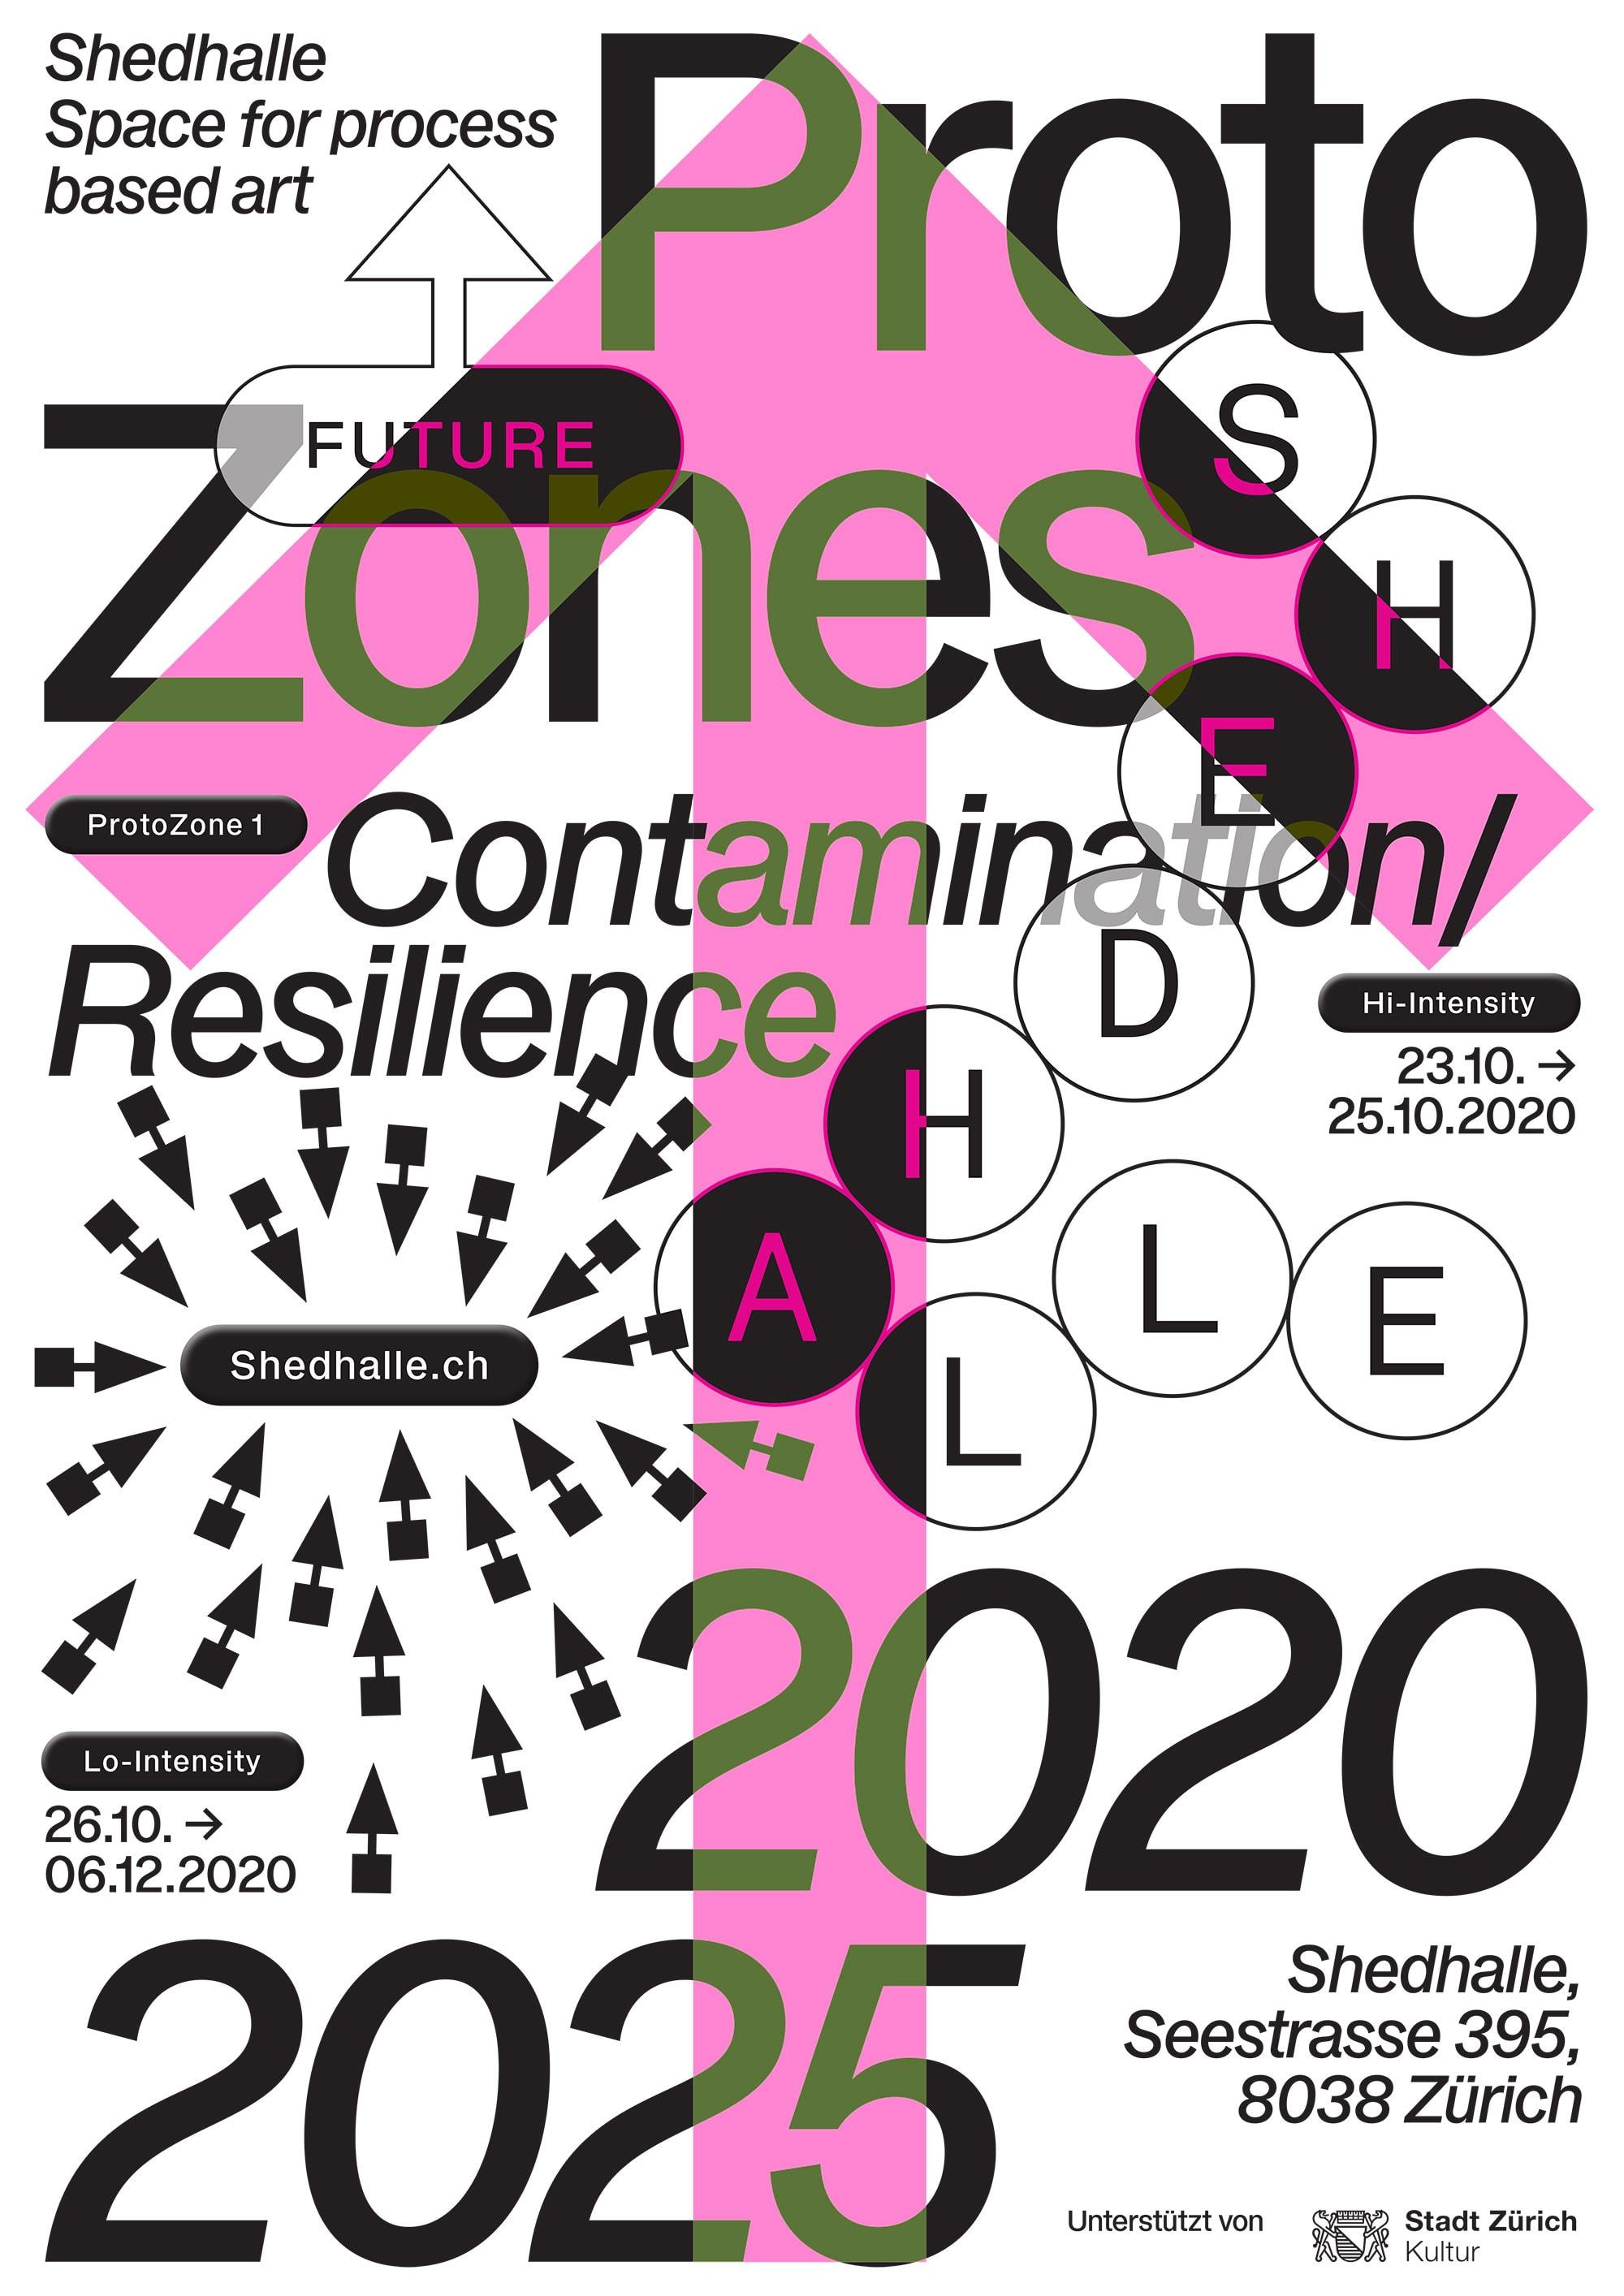 Shedhalle – Protozonen 2020-2025 Medien- konferenz